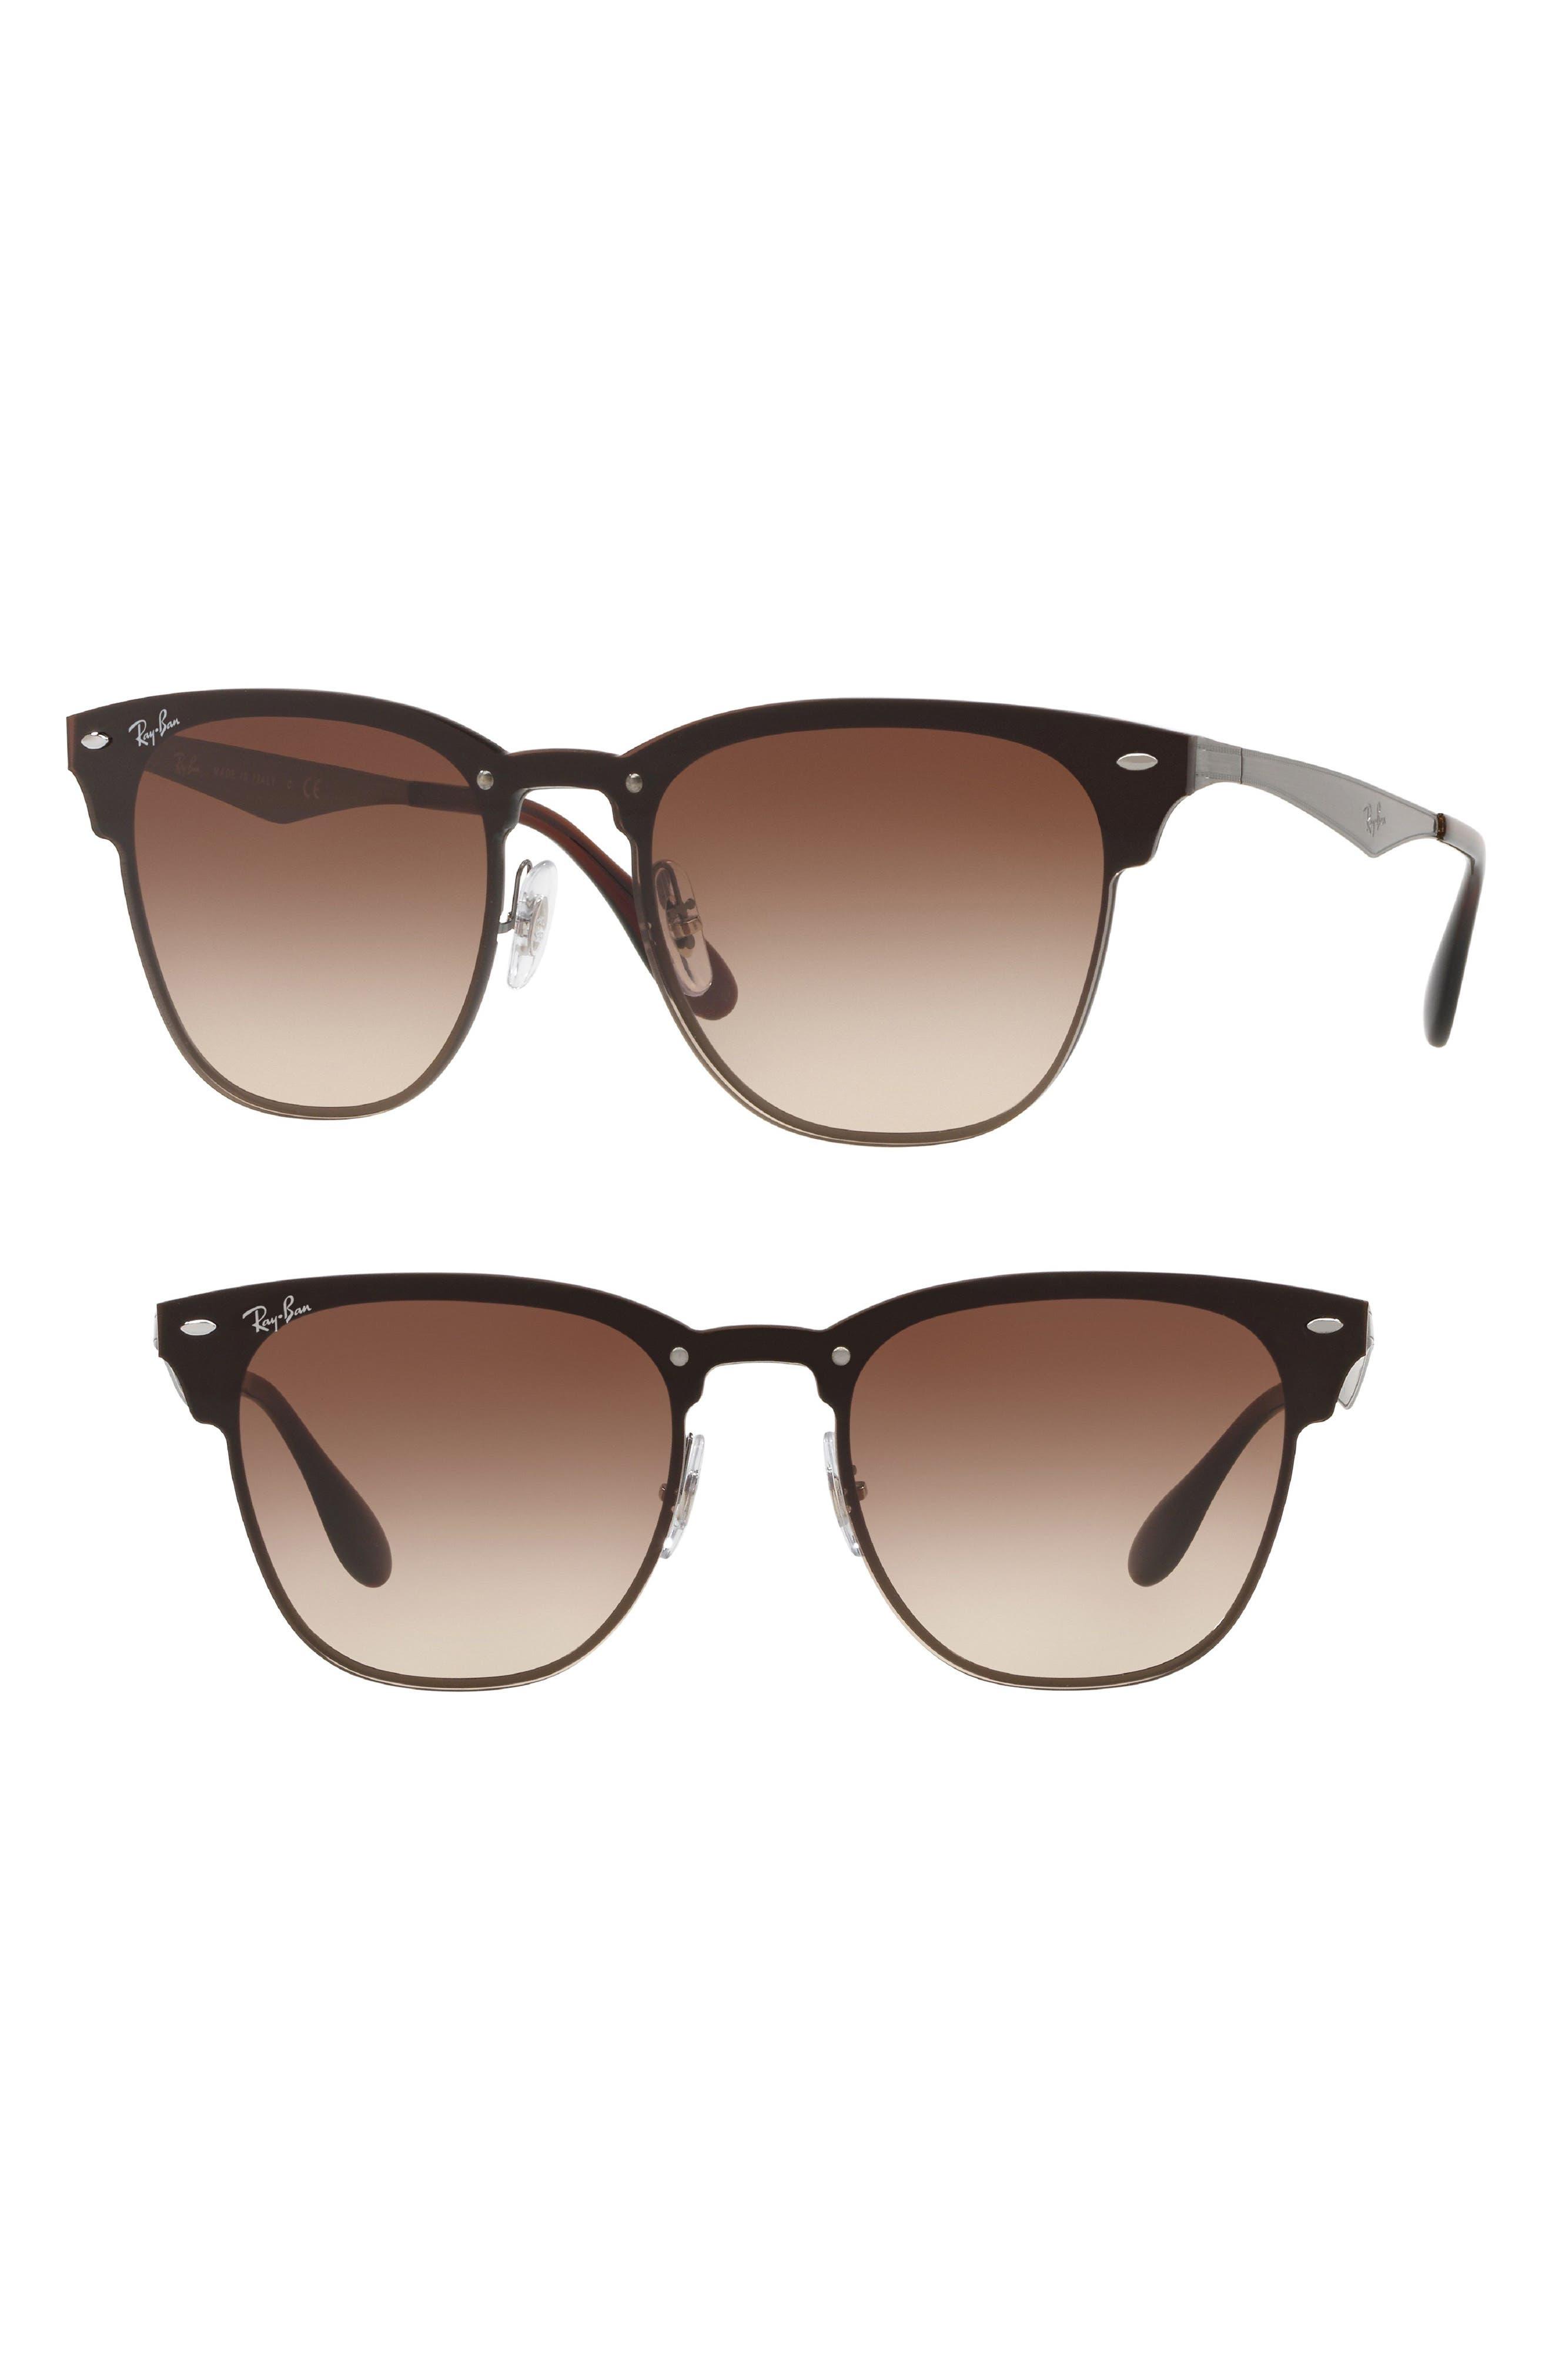 Ray-Ban Blaze Clubmaster 50Mm Sunglasses -